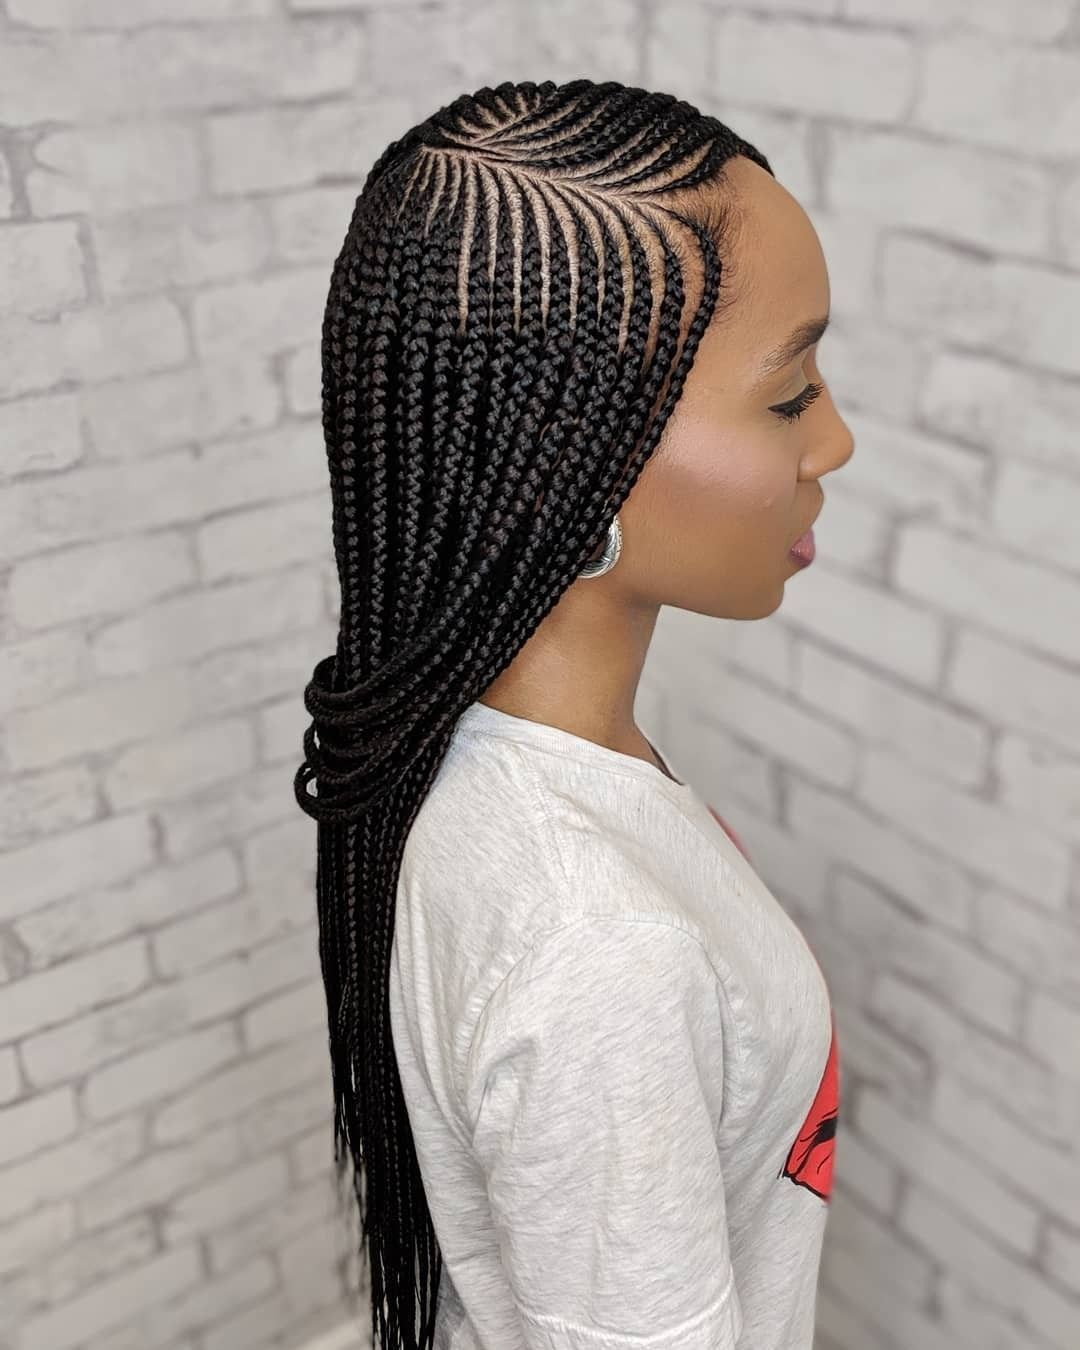 Long Braids Hairstyles Braidedhairstylesforblackwomen Trendyhairstyles Girl African Hair Braiding Styles African Braids Styles Human Braiding Hair